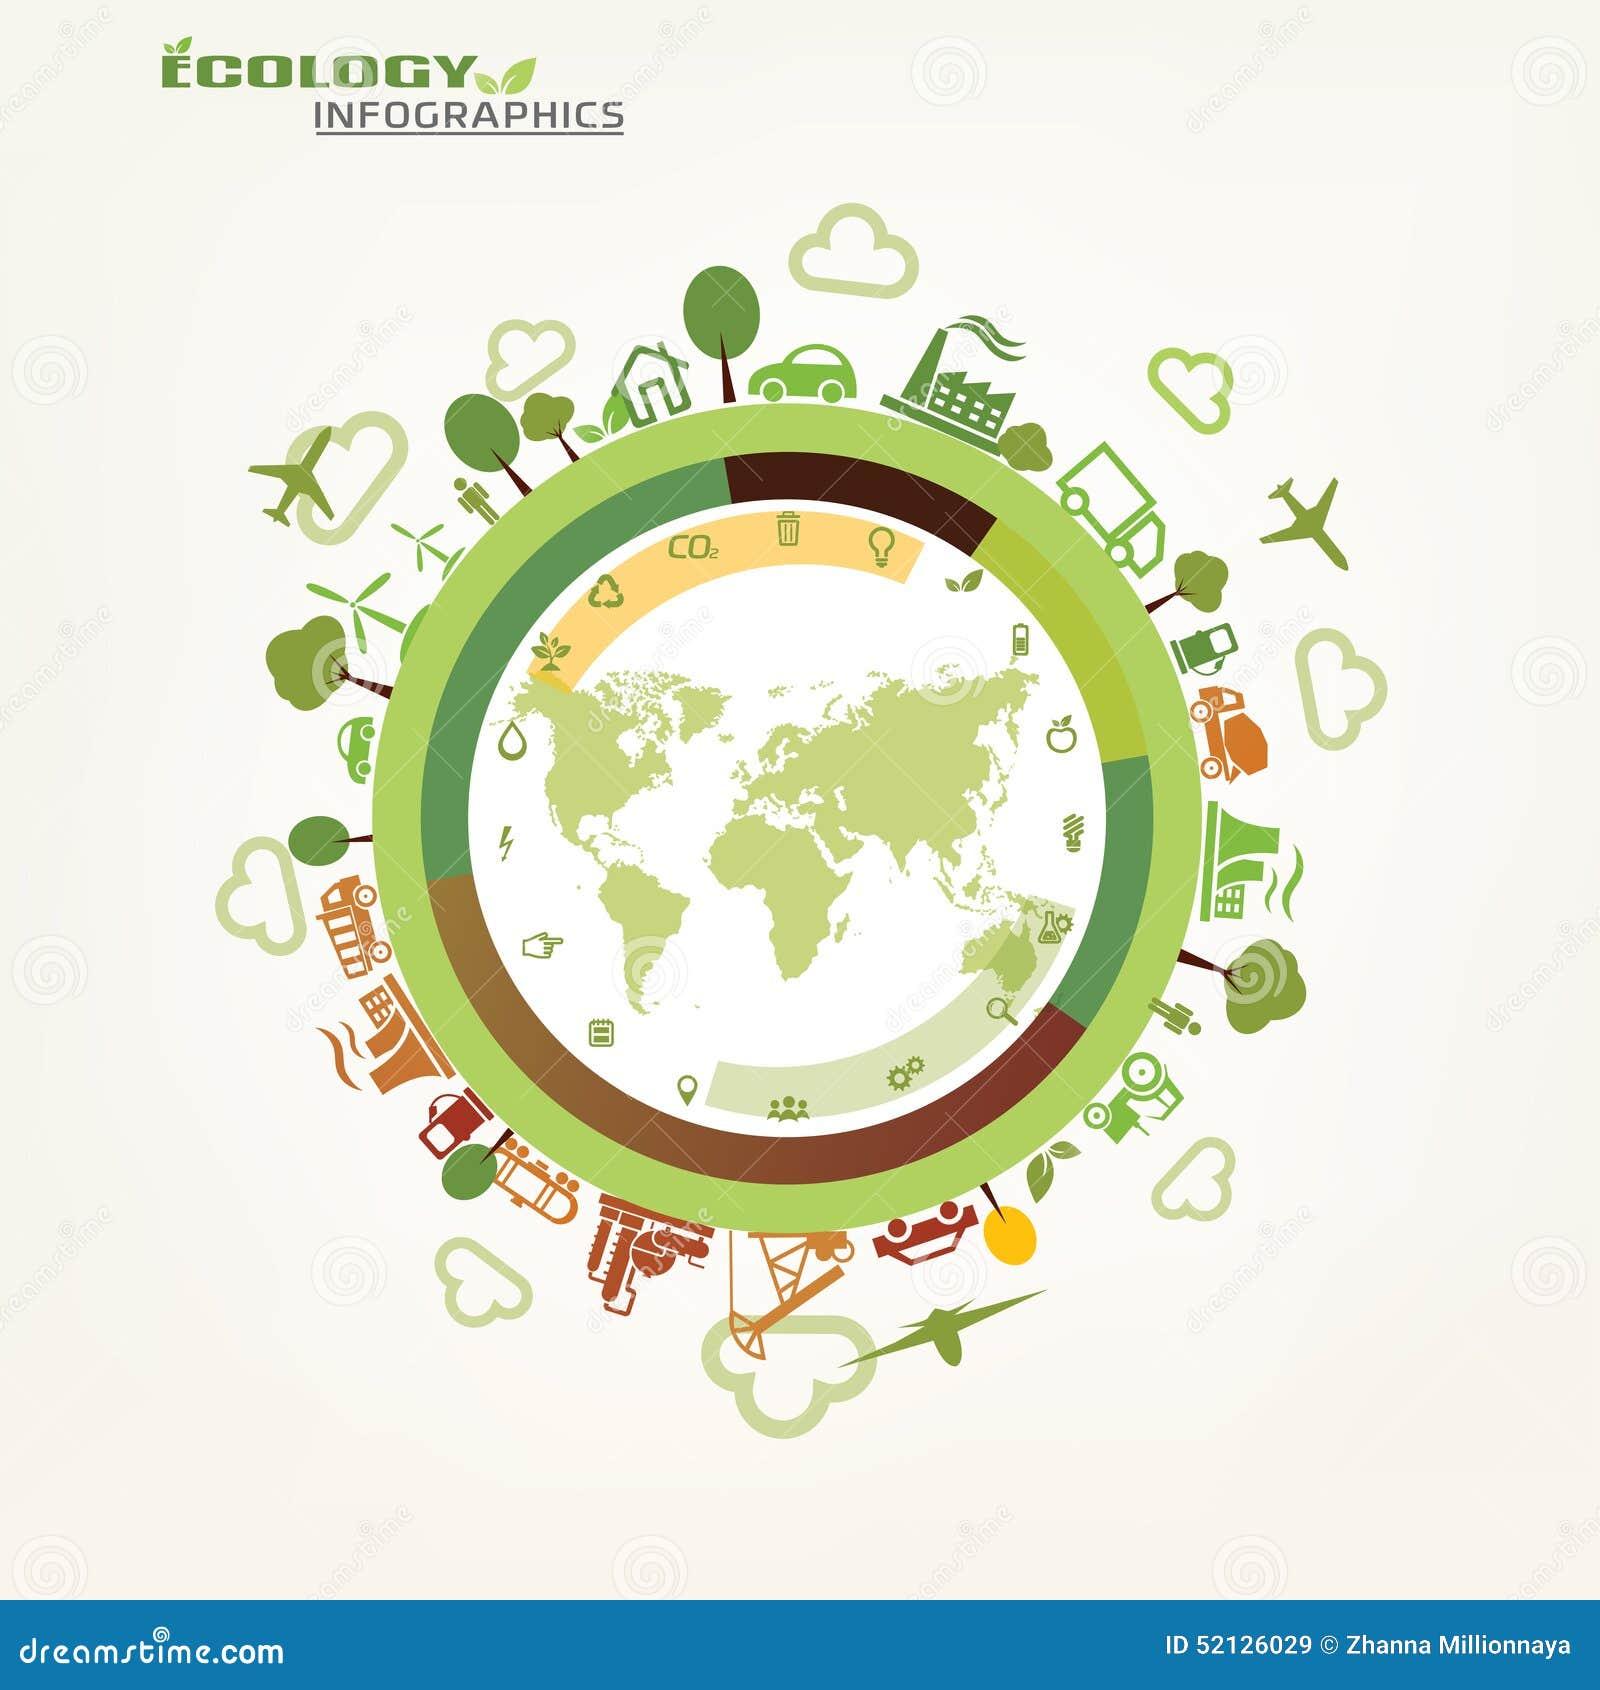 view sustainable human development